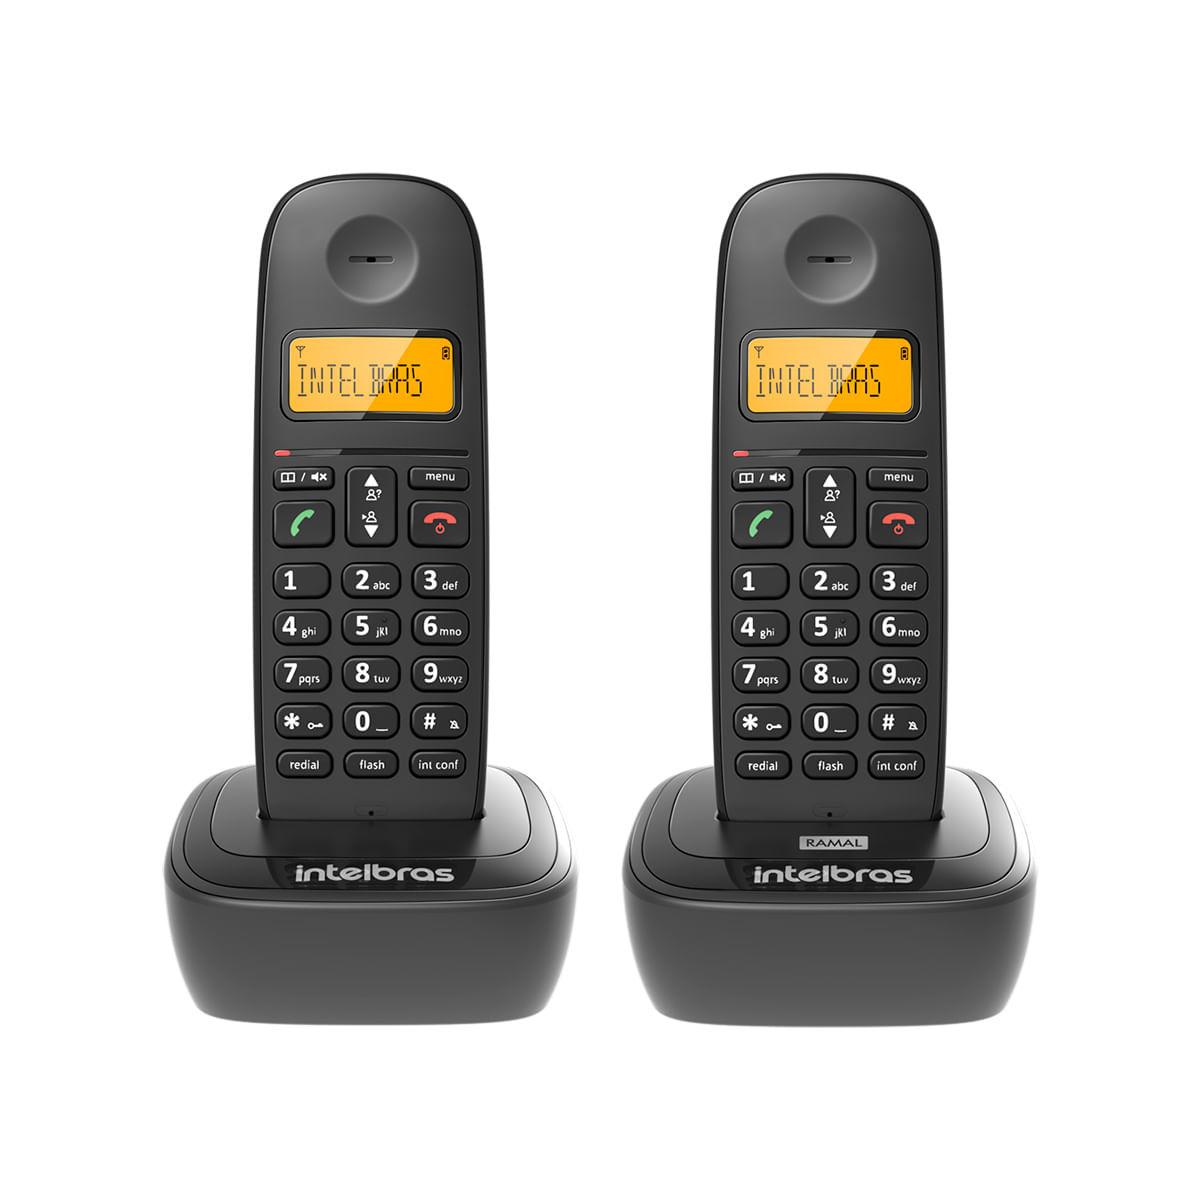 Kit Telefone sem Fio Intelbras + Ramal TS 2512